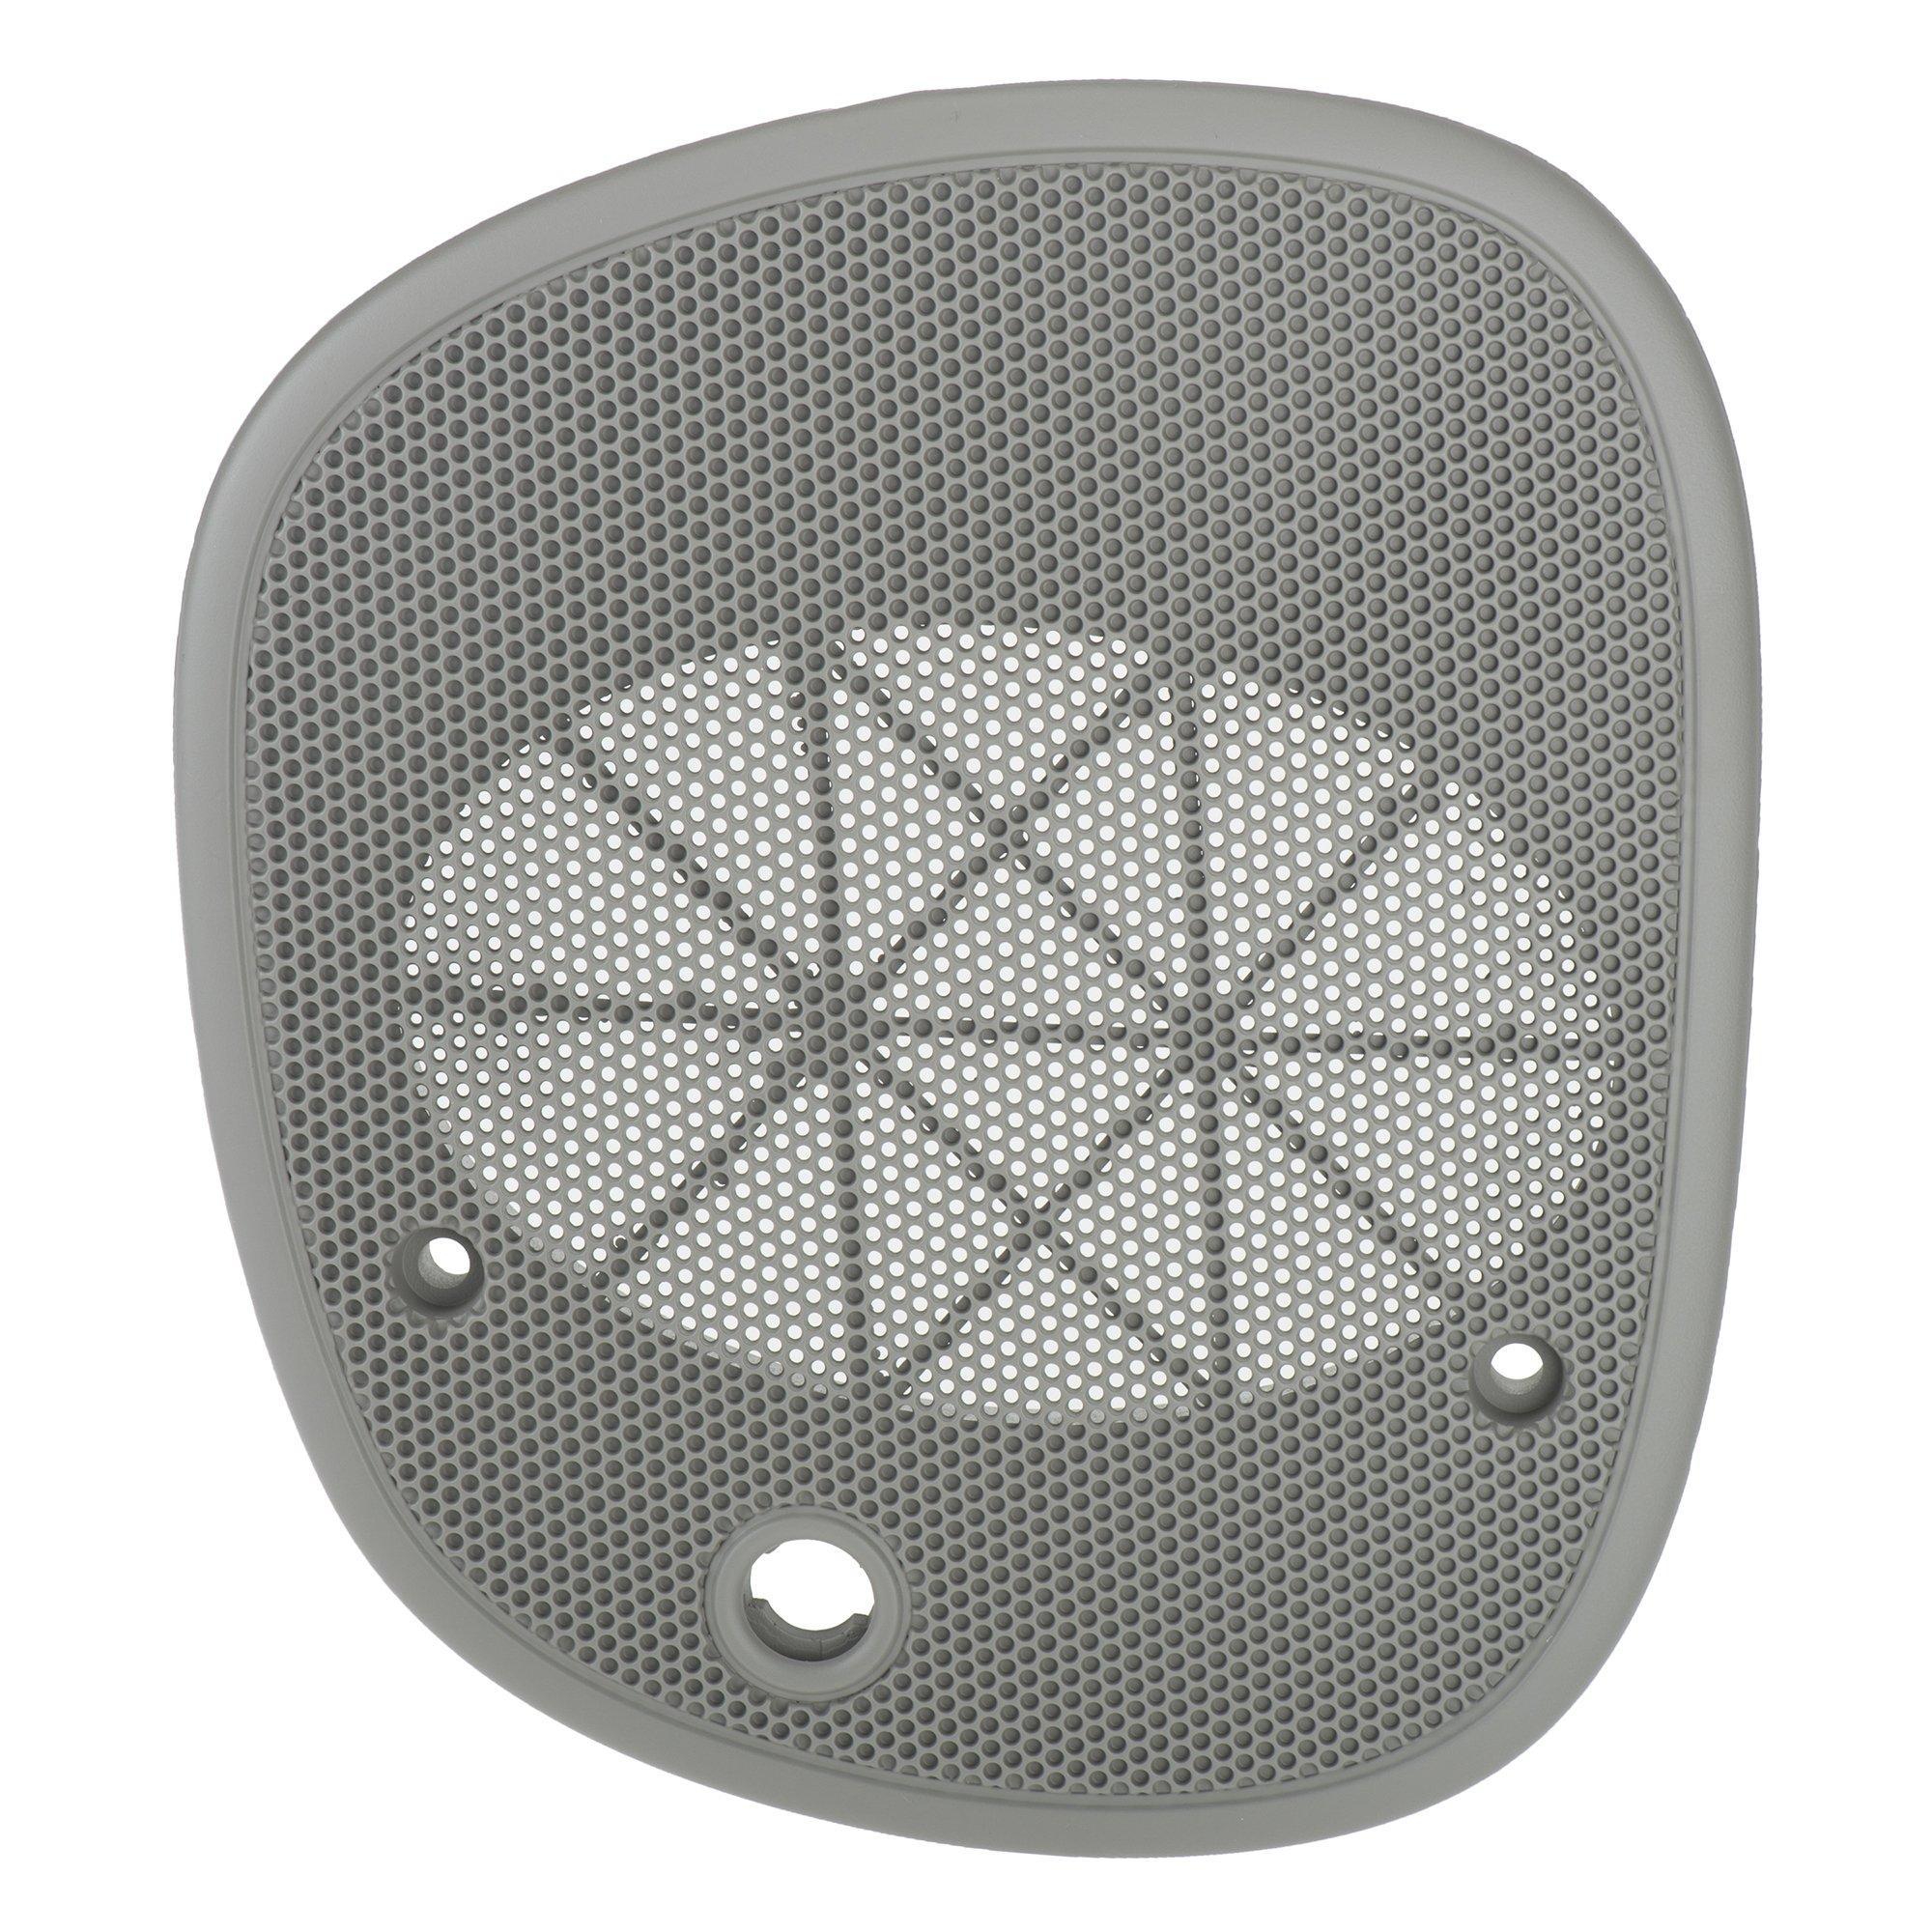 OEM NEW Front Right Passenger Speaker Grille Cover 98-05 Chevrolet GMC 15046446 by GMC